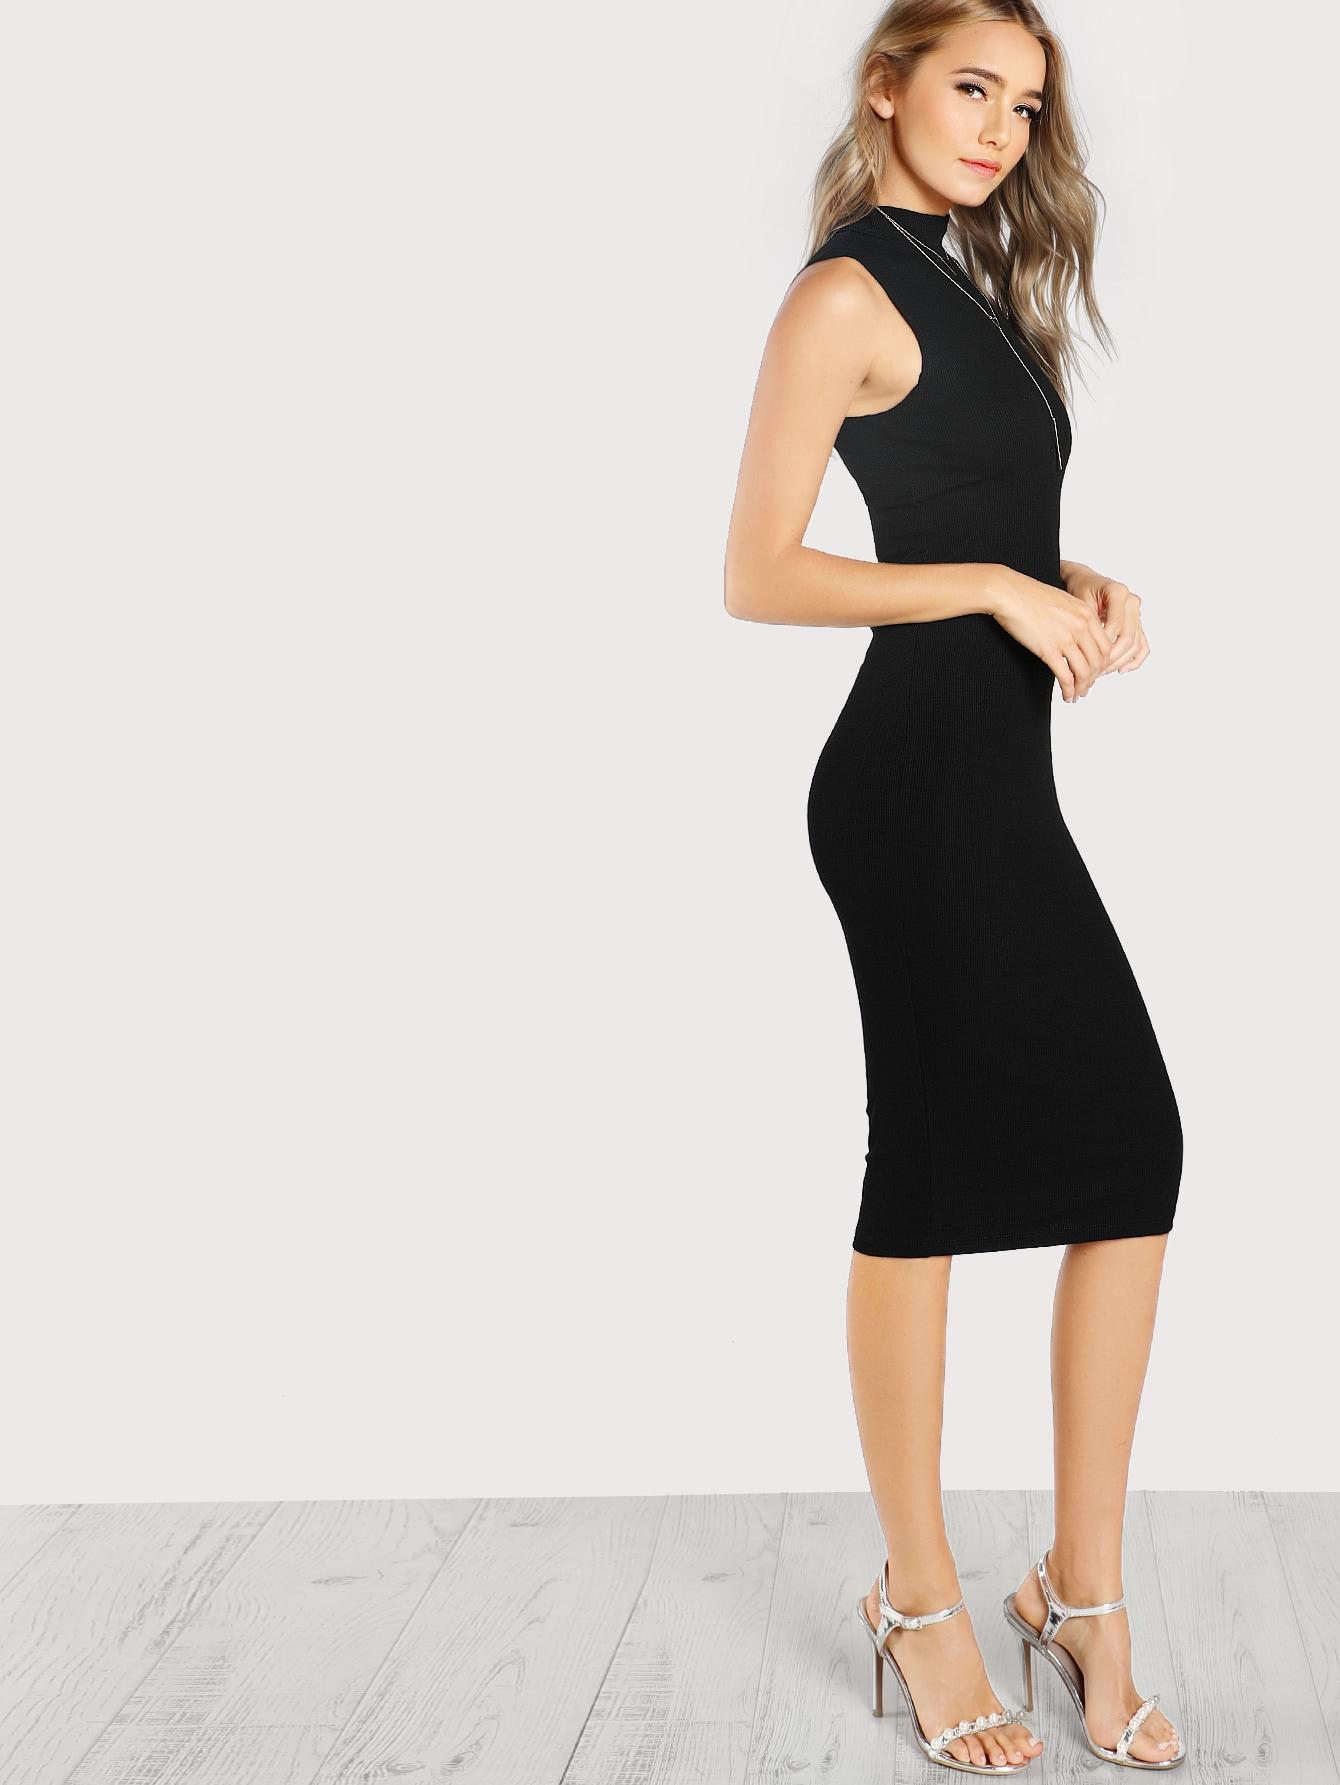 High Neck Rib Knit Sleeveless Bodycon Dress